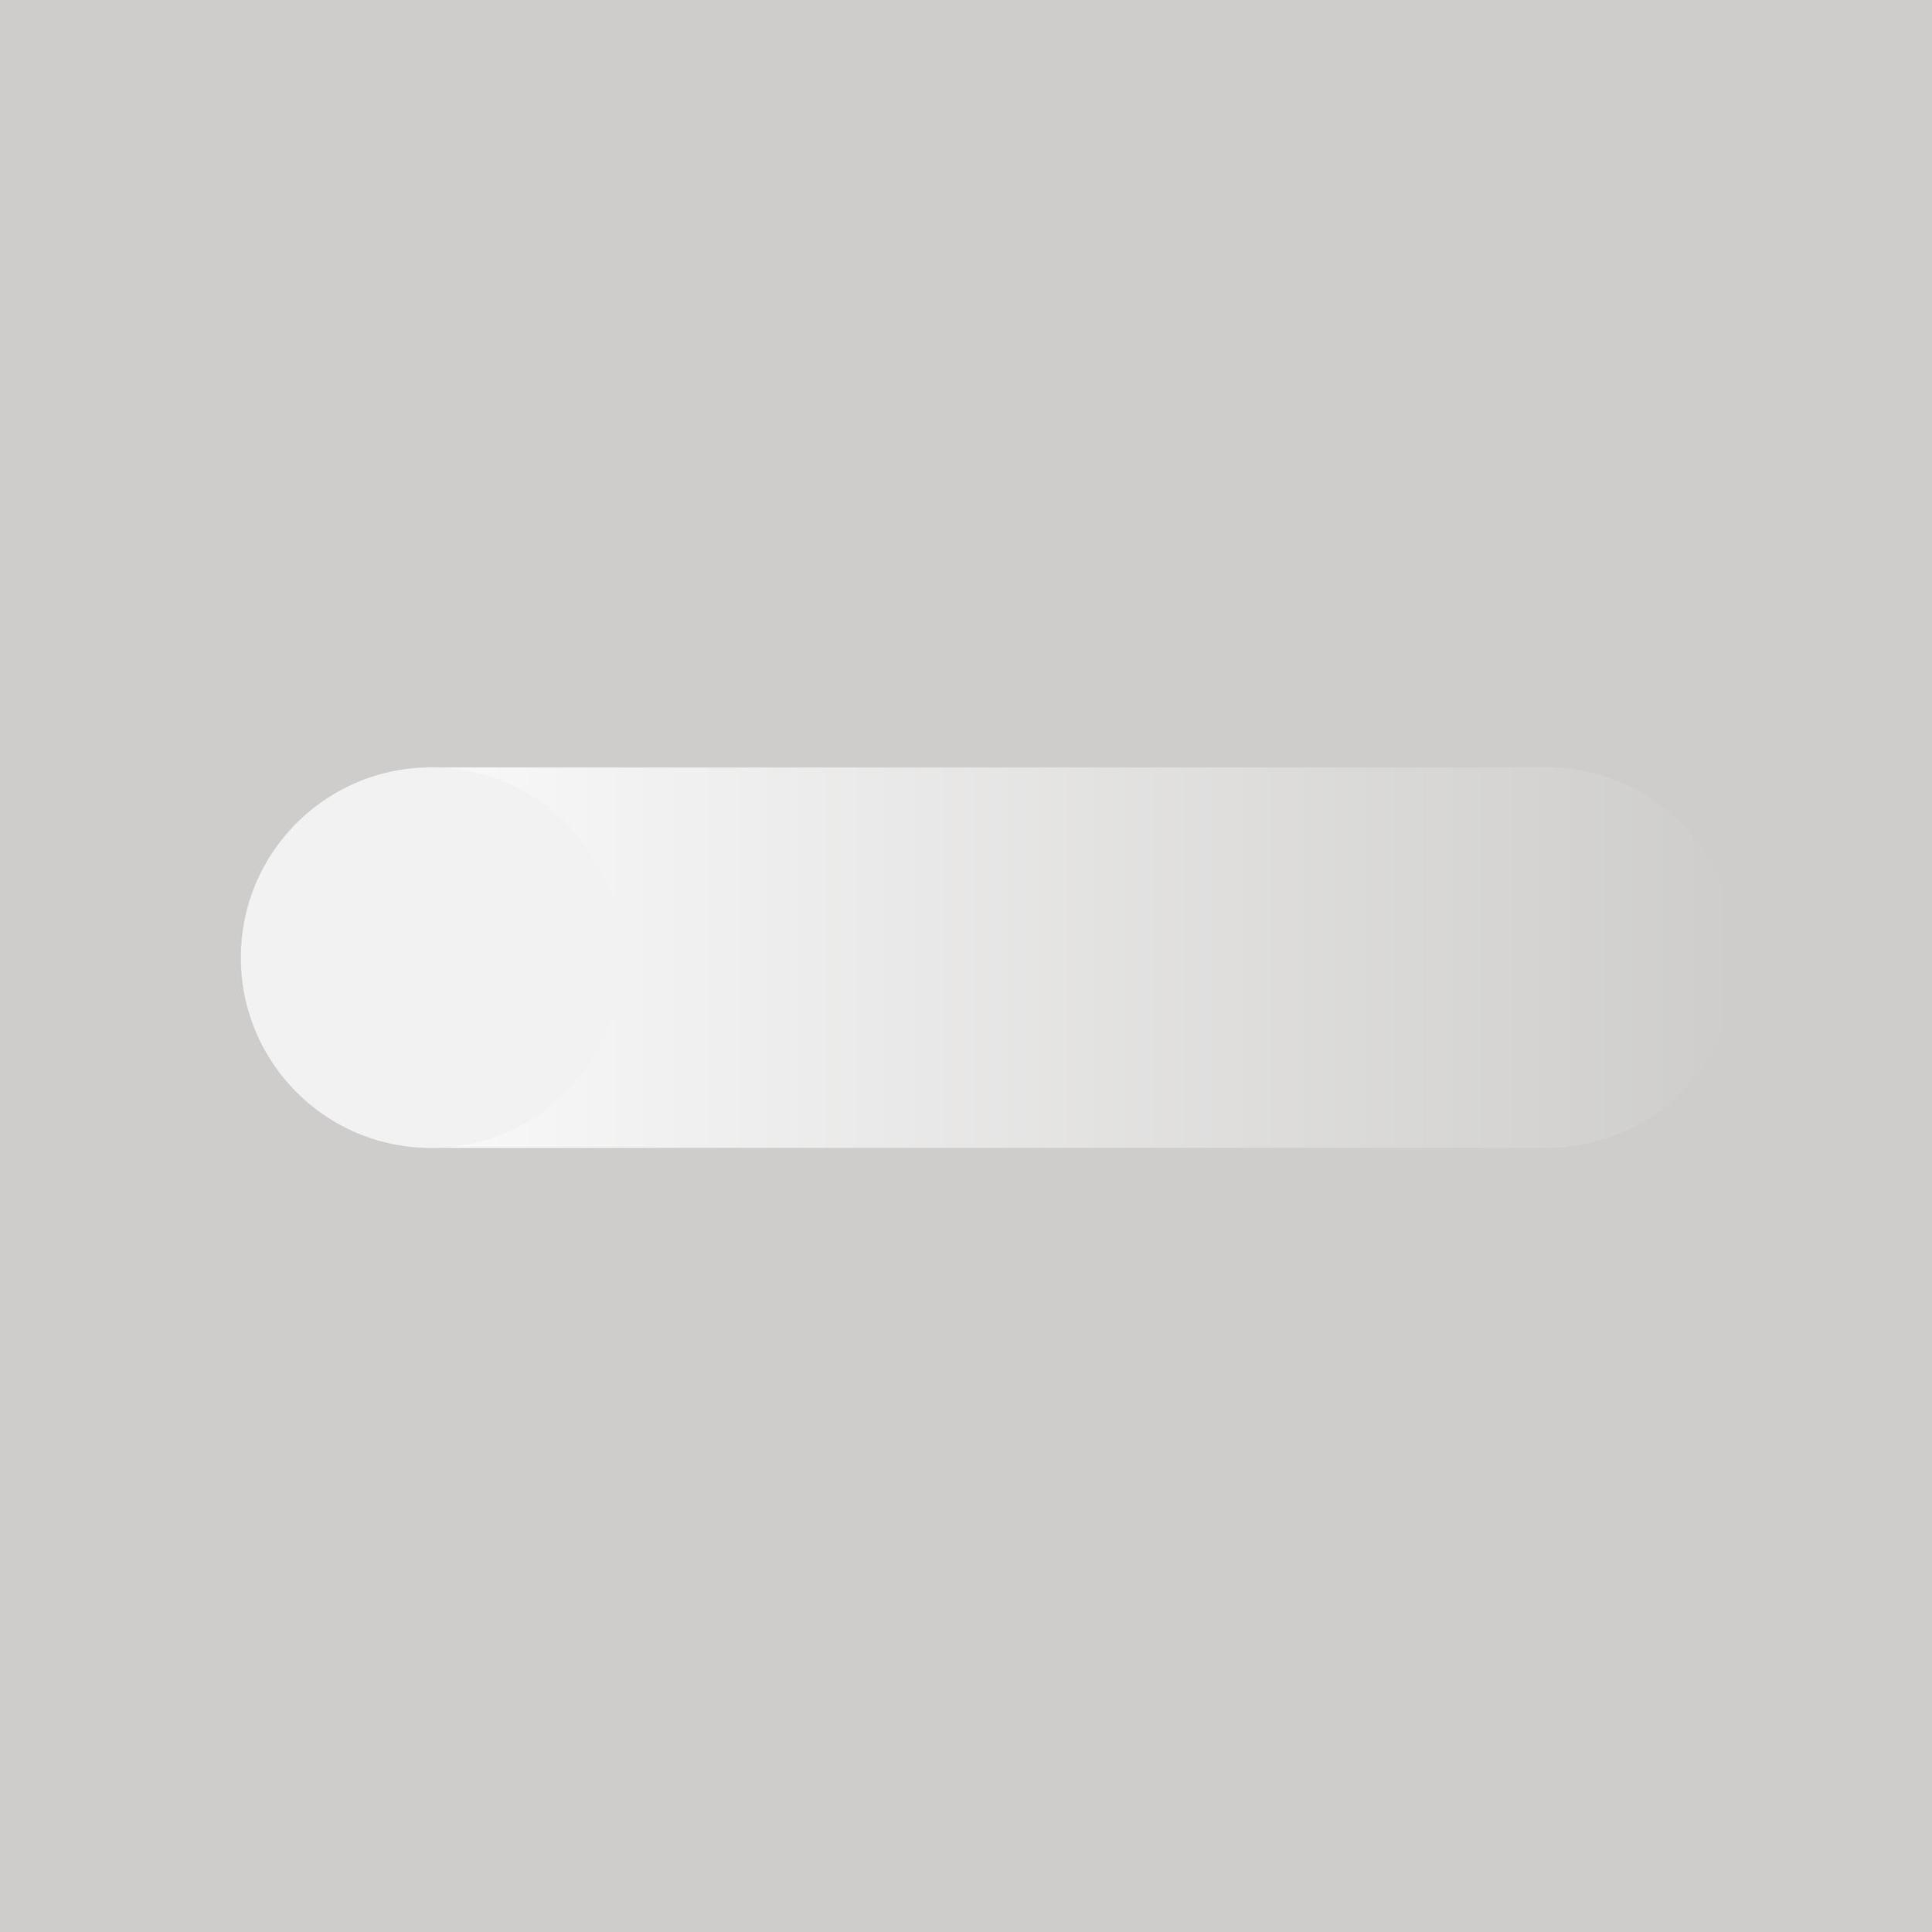 Speed_Pattern-14.jpg